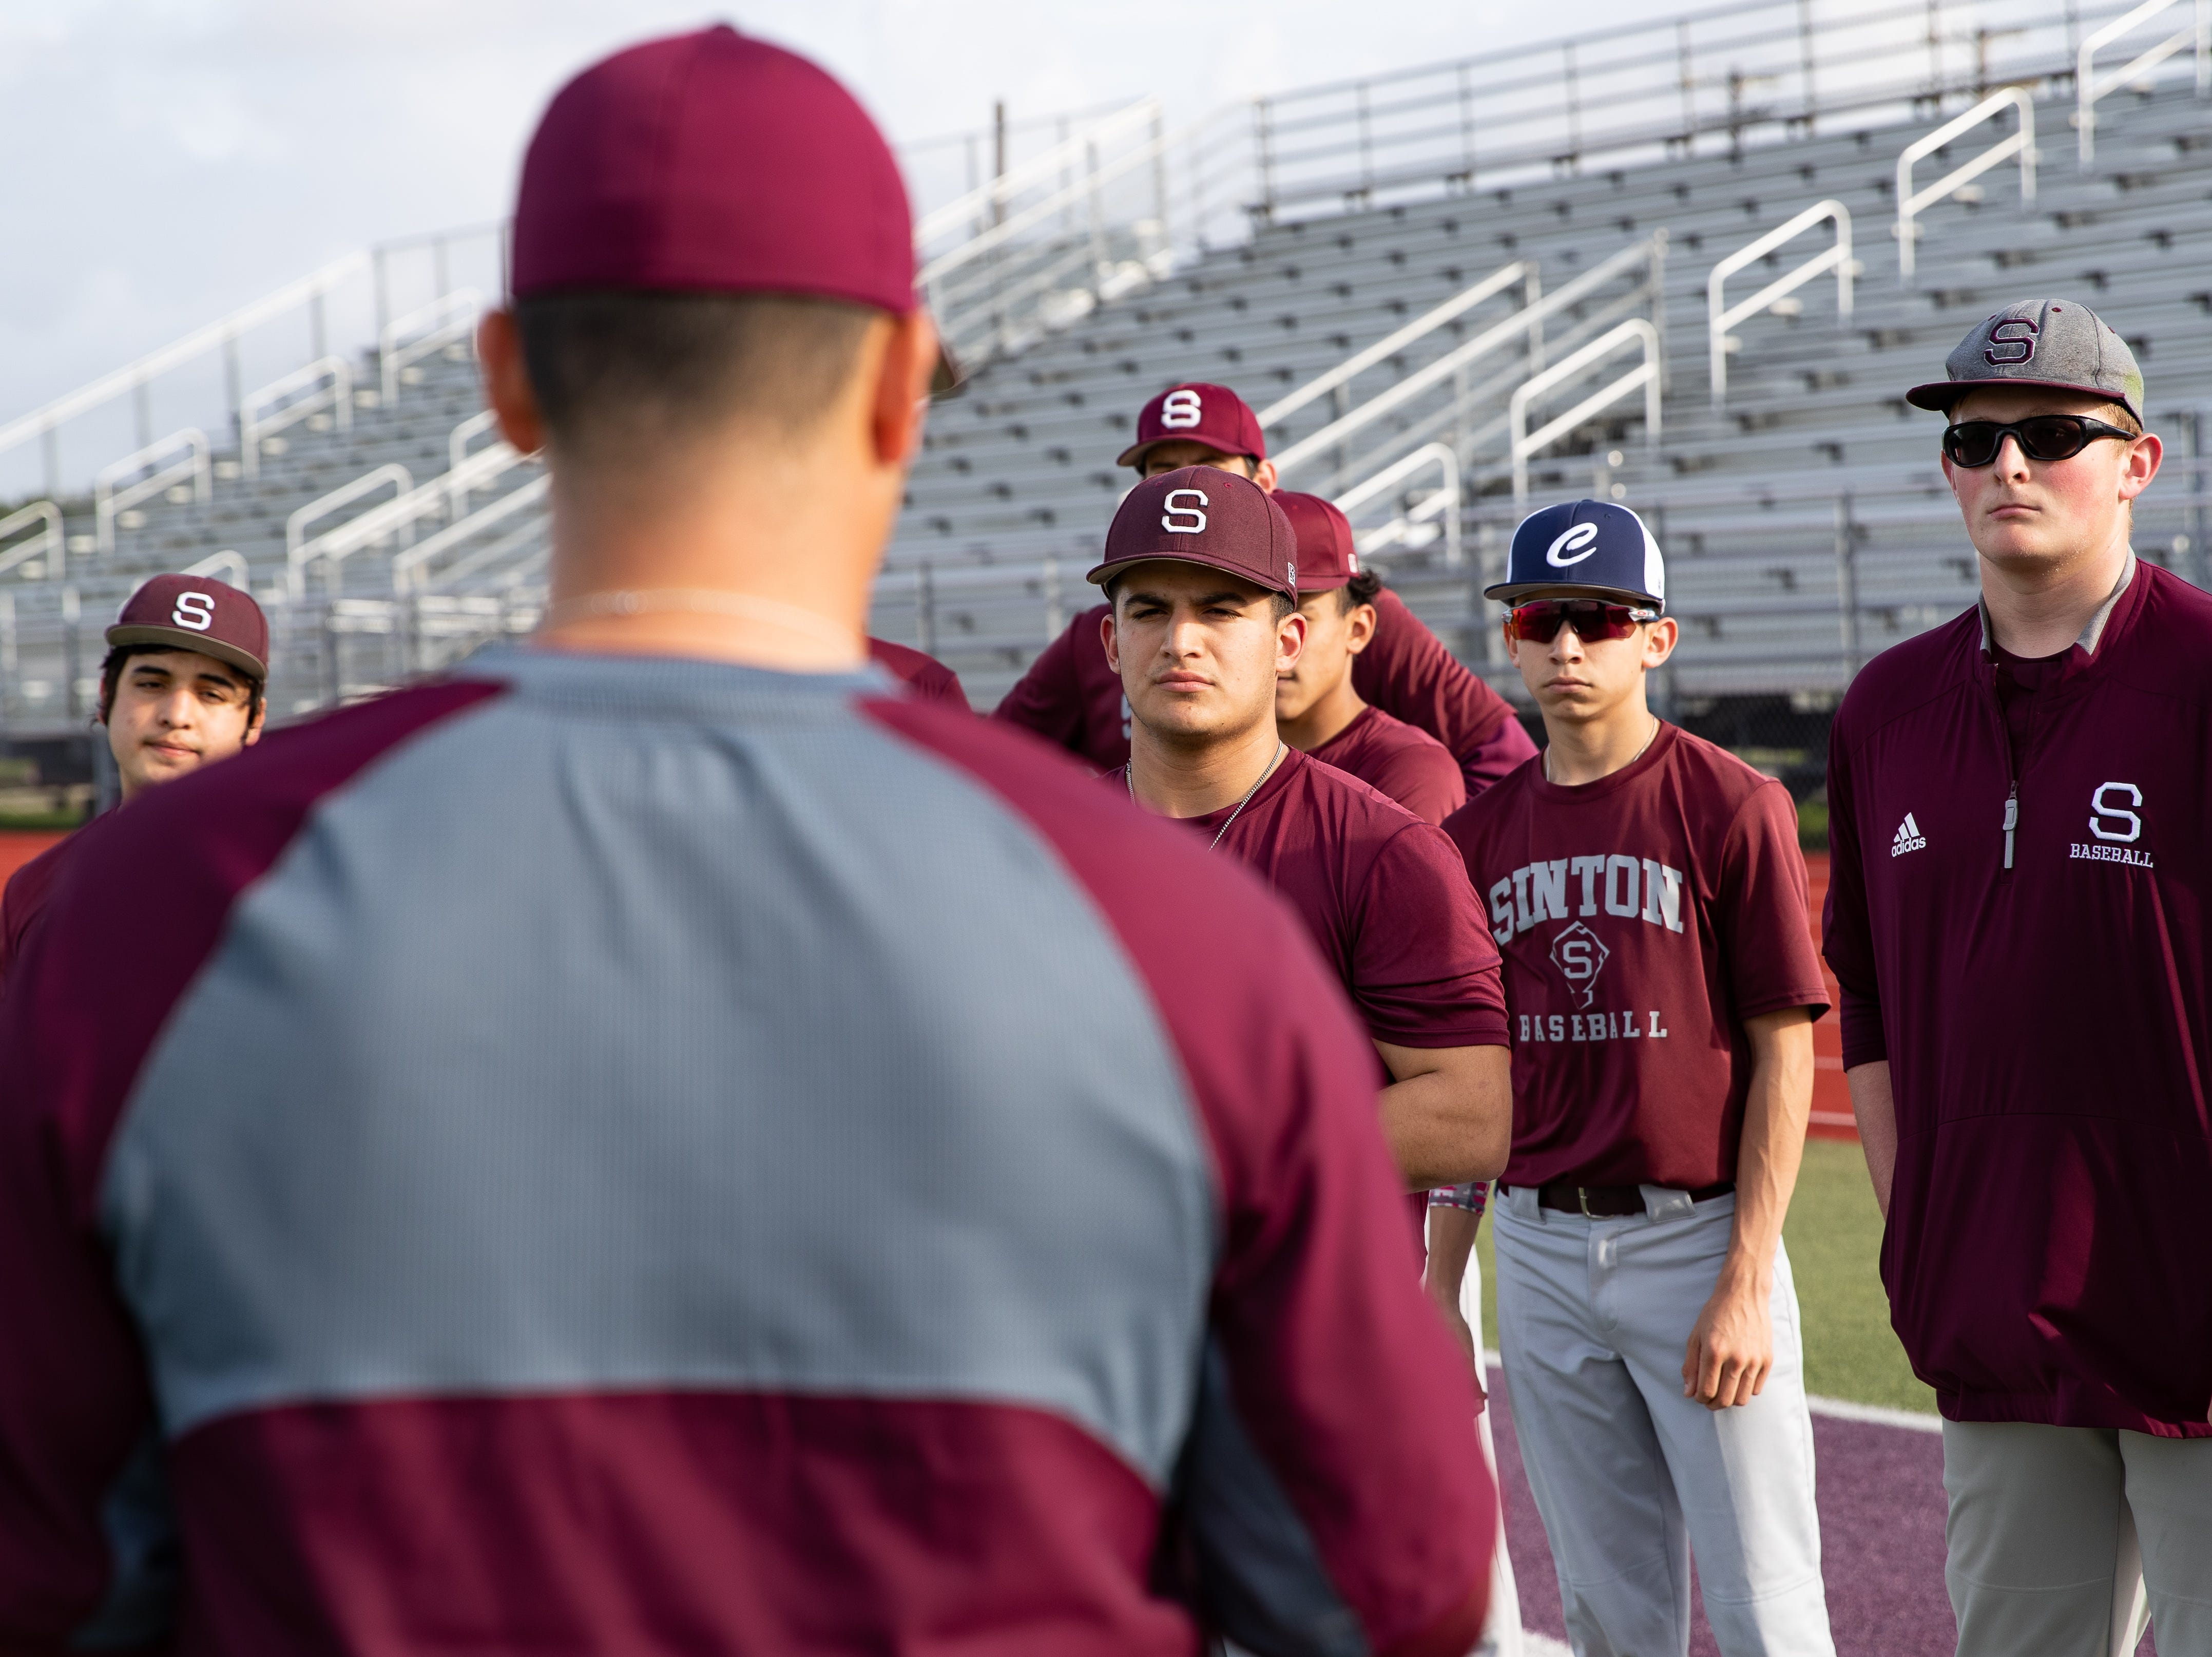 Sinton High School baseball team during practice on Friday, Feb. 1, 2019.